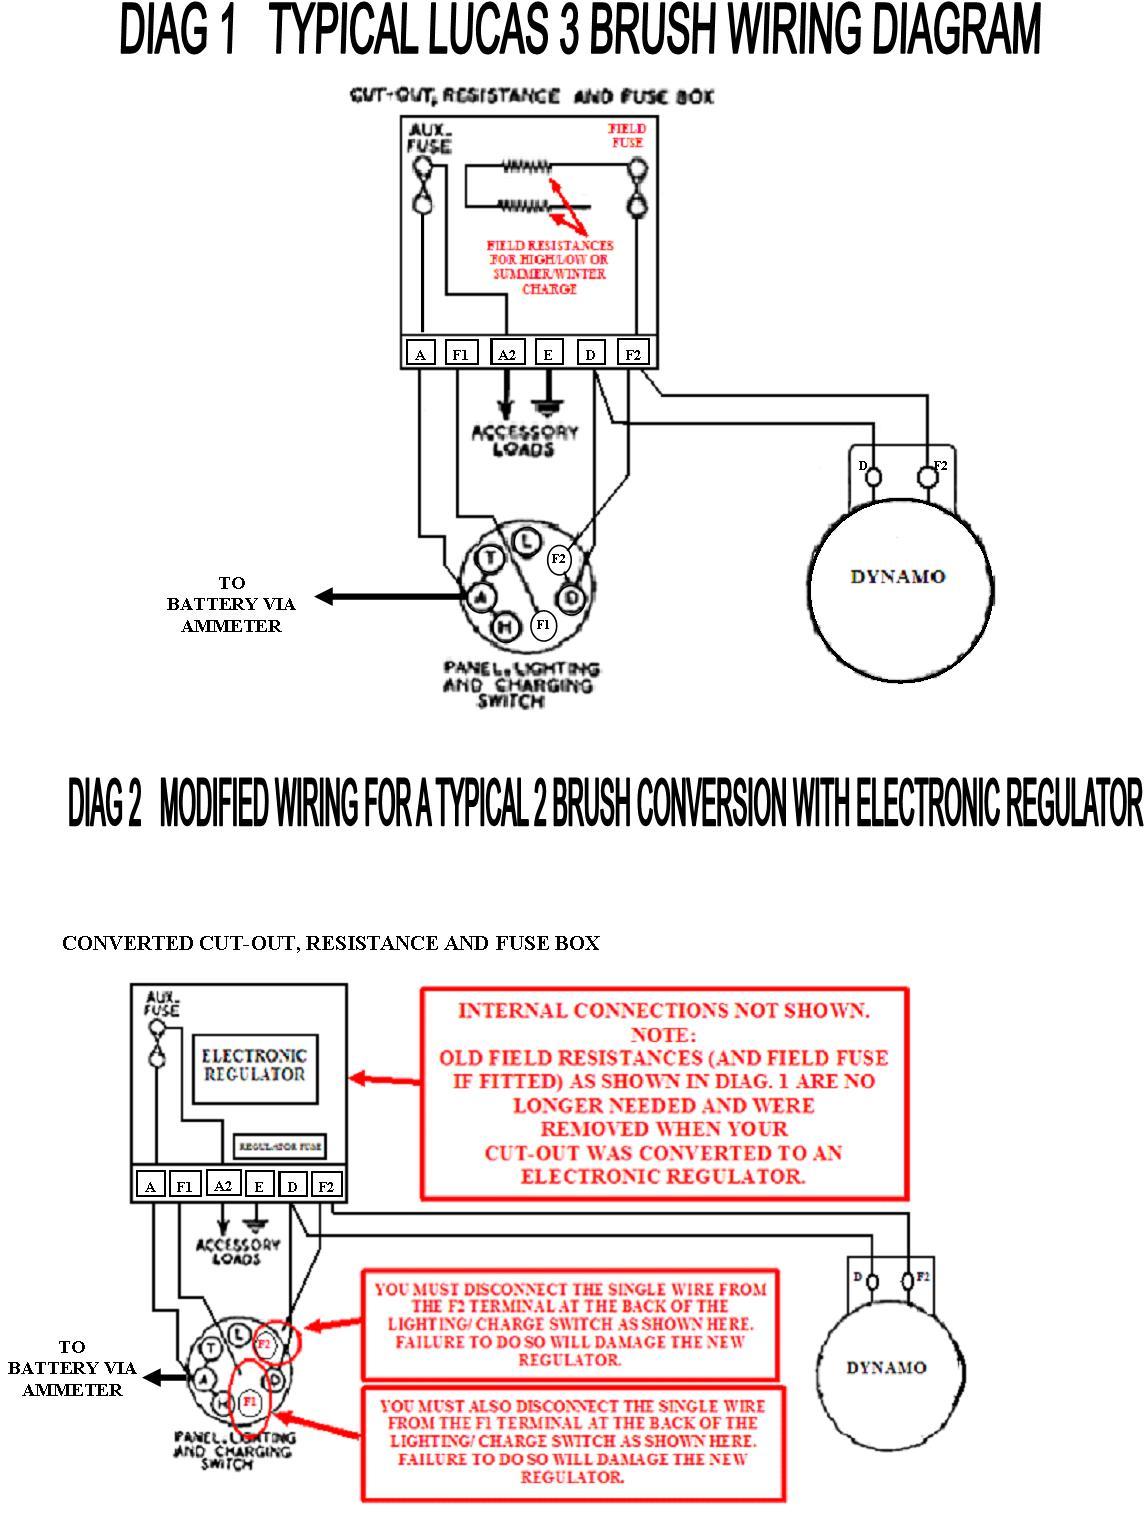 Cool mgb alternator conversion wiring diagram pictures inspiration stunning mgb alternator conversion wiring diagram images asfbconference2016 Choice Image